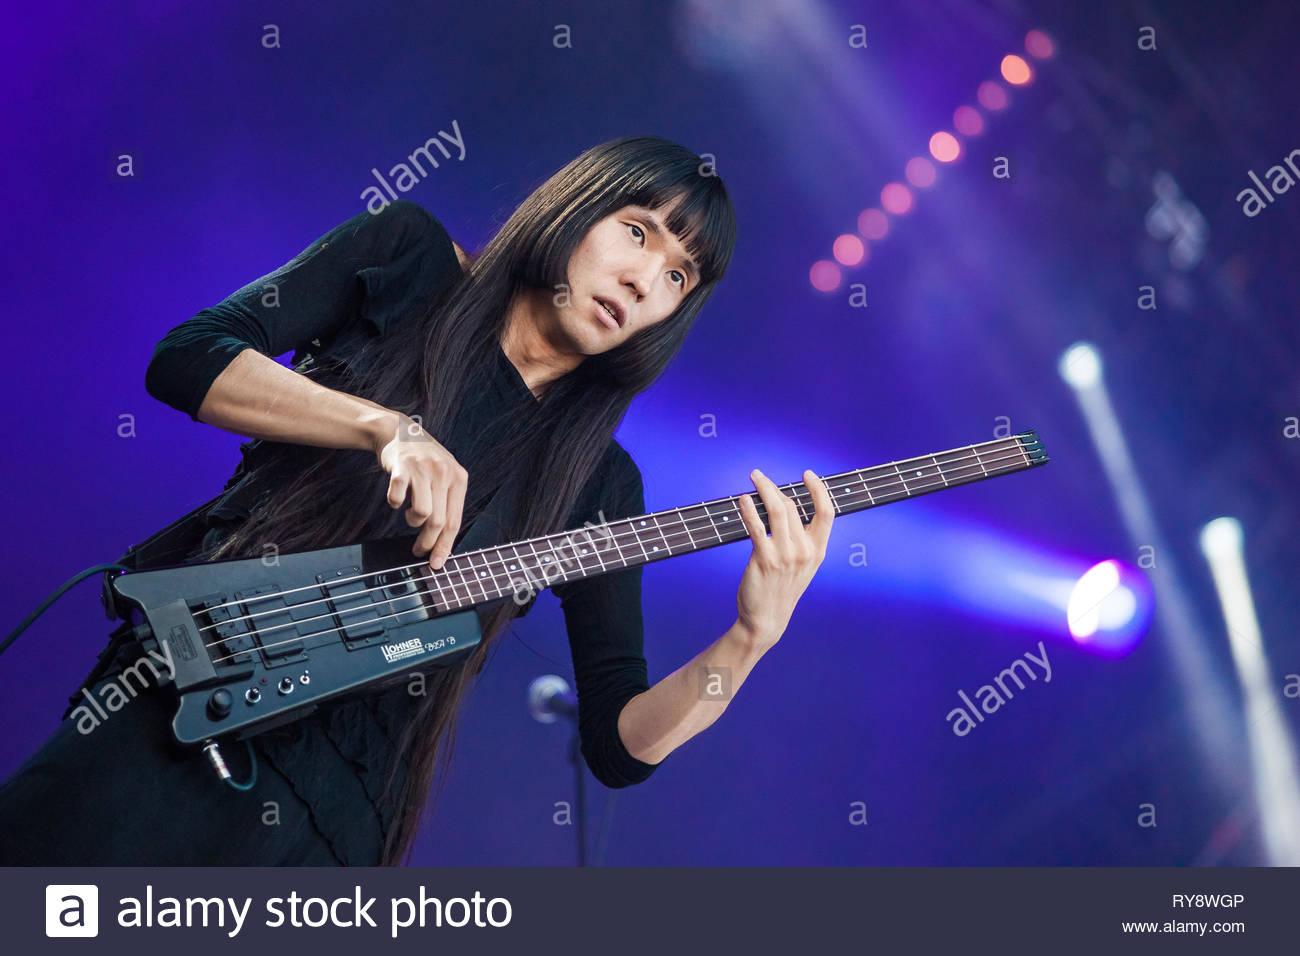 BO NINGEN performing live, 13 july 2015 Stock Photo